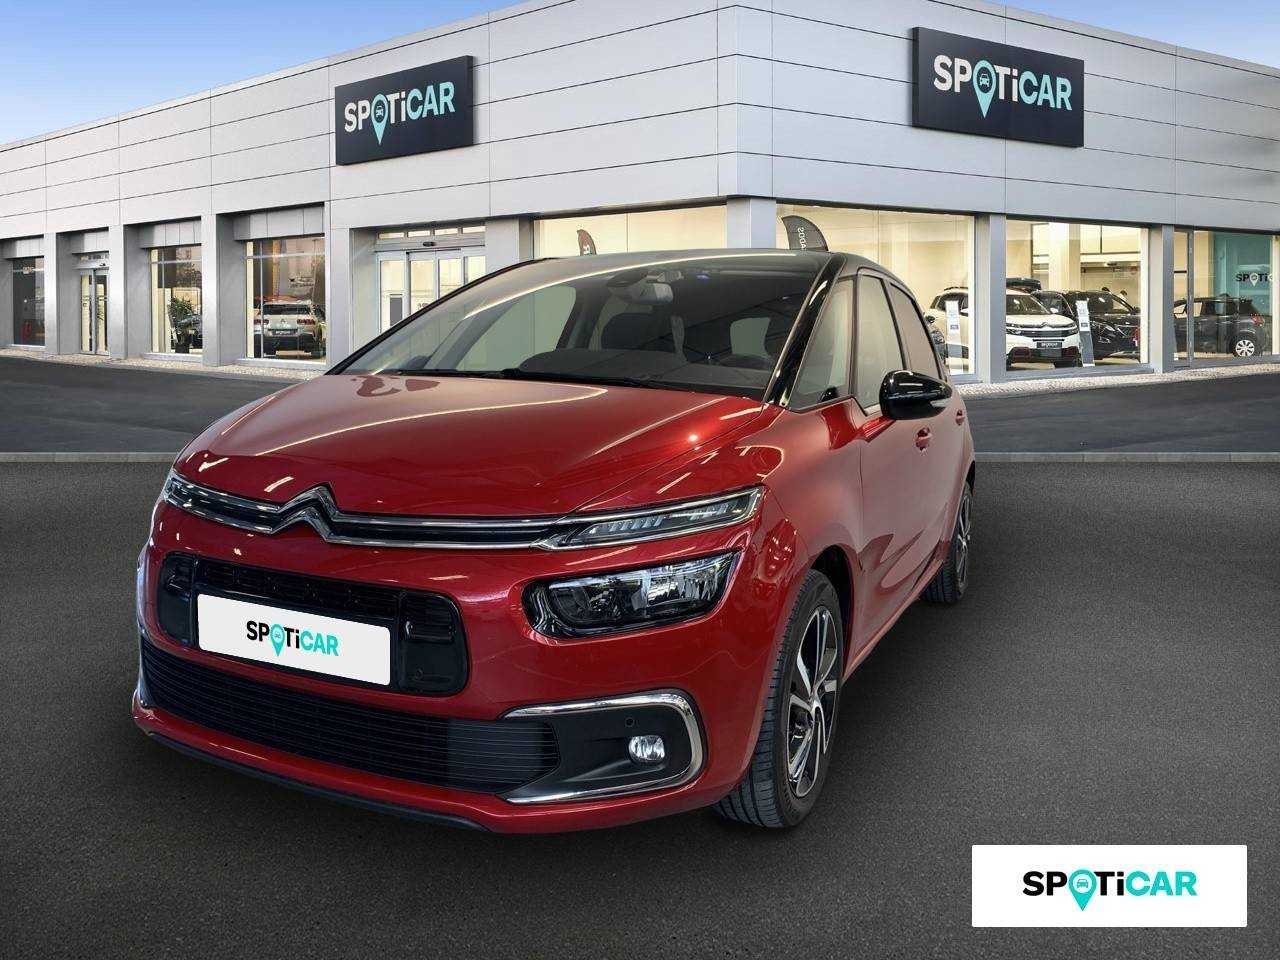 Citroën C4 Picasso ocasión segunda mano 2018 Diésel por 18.975€ en Zaragoza